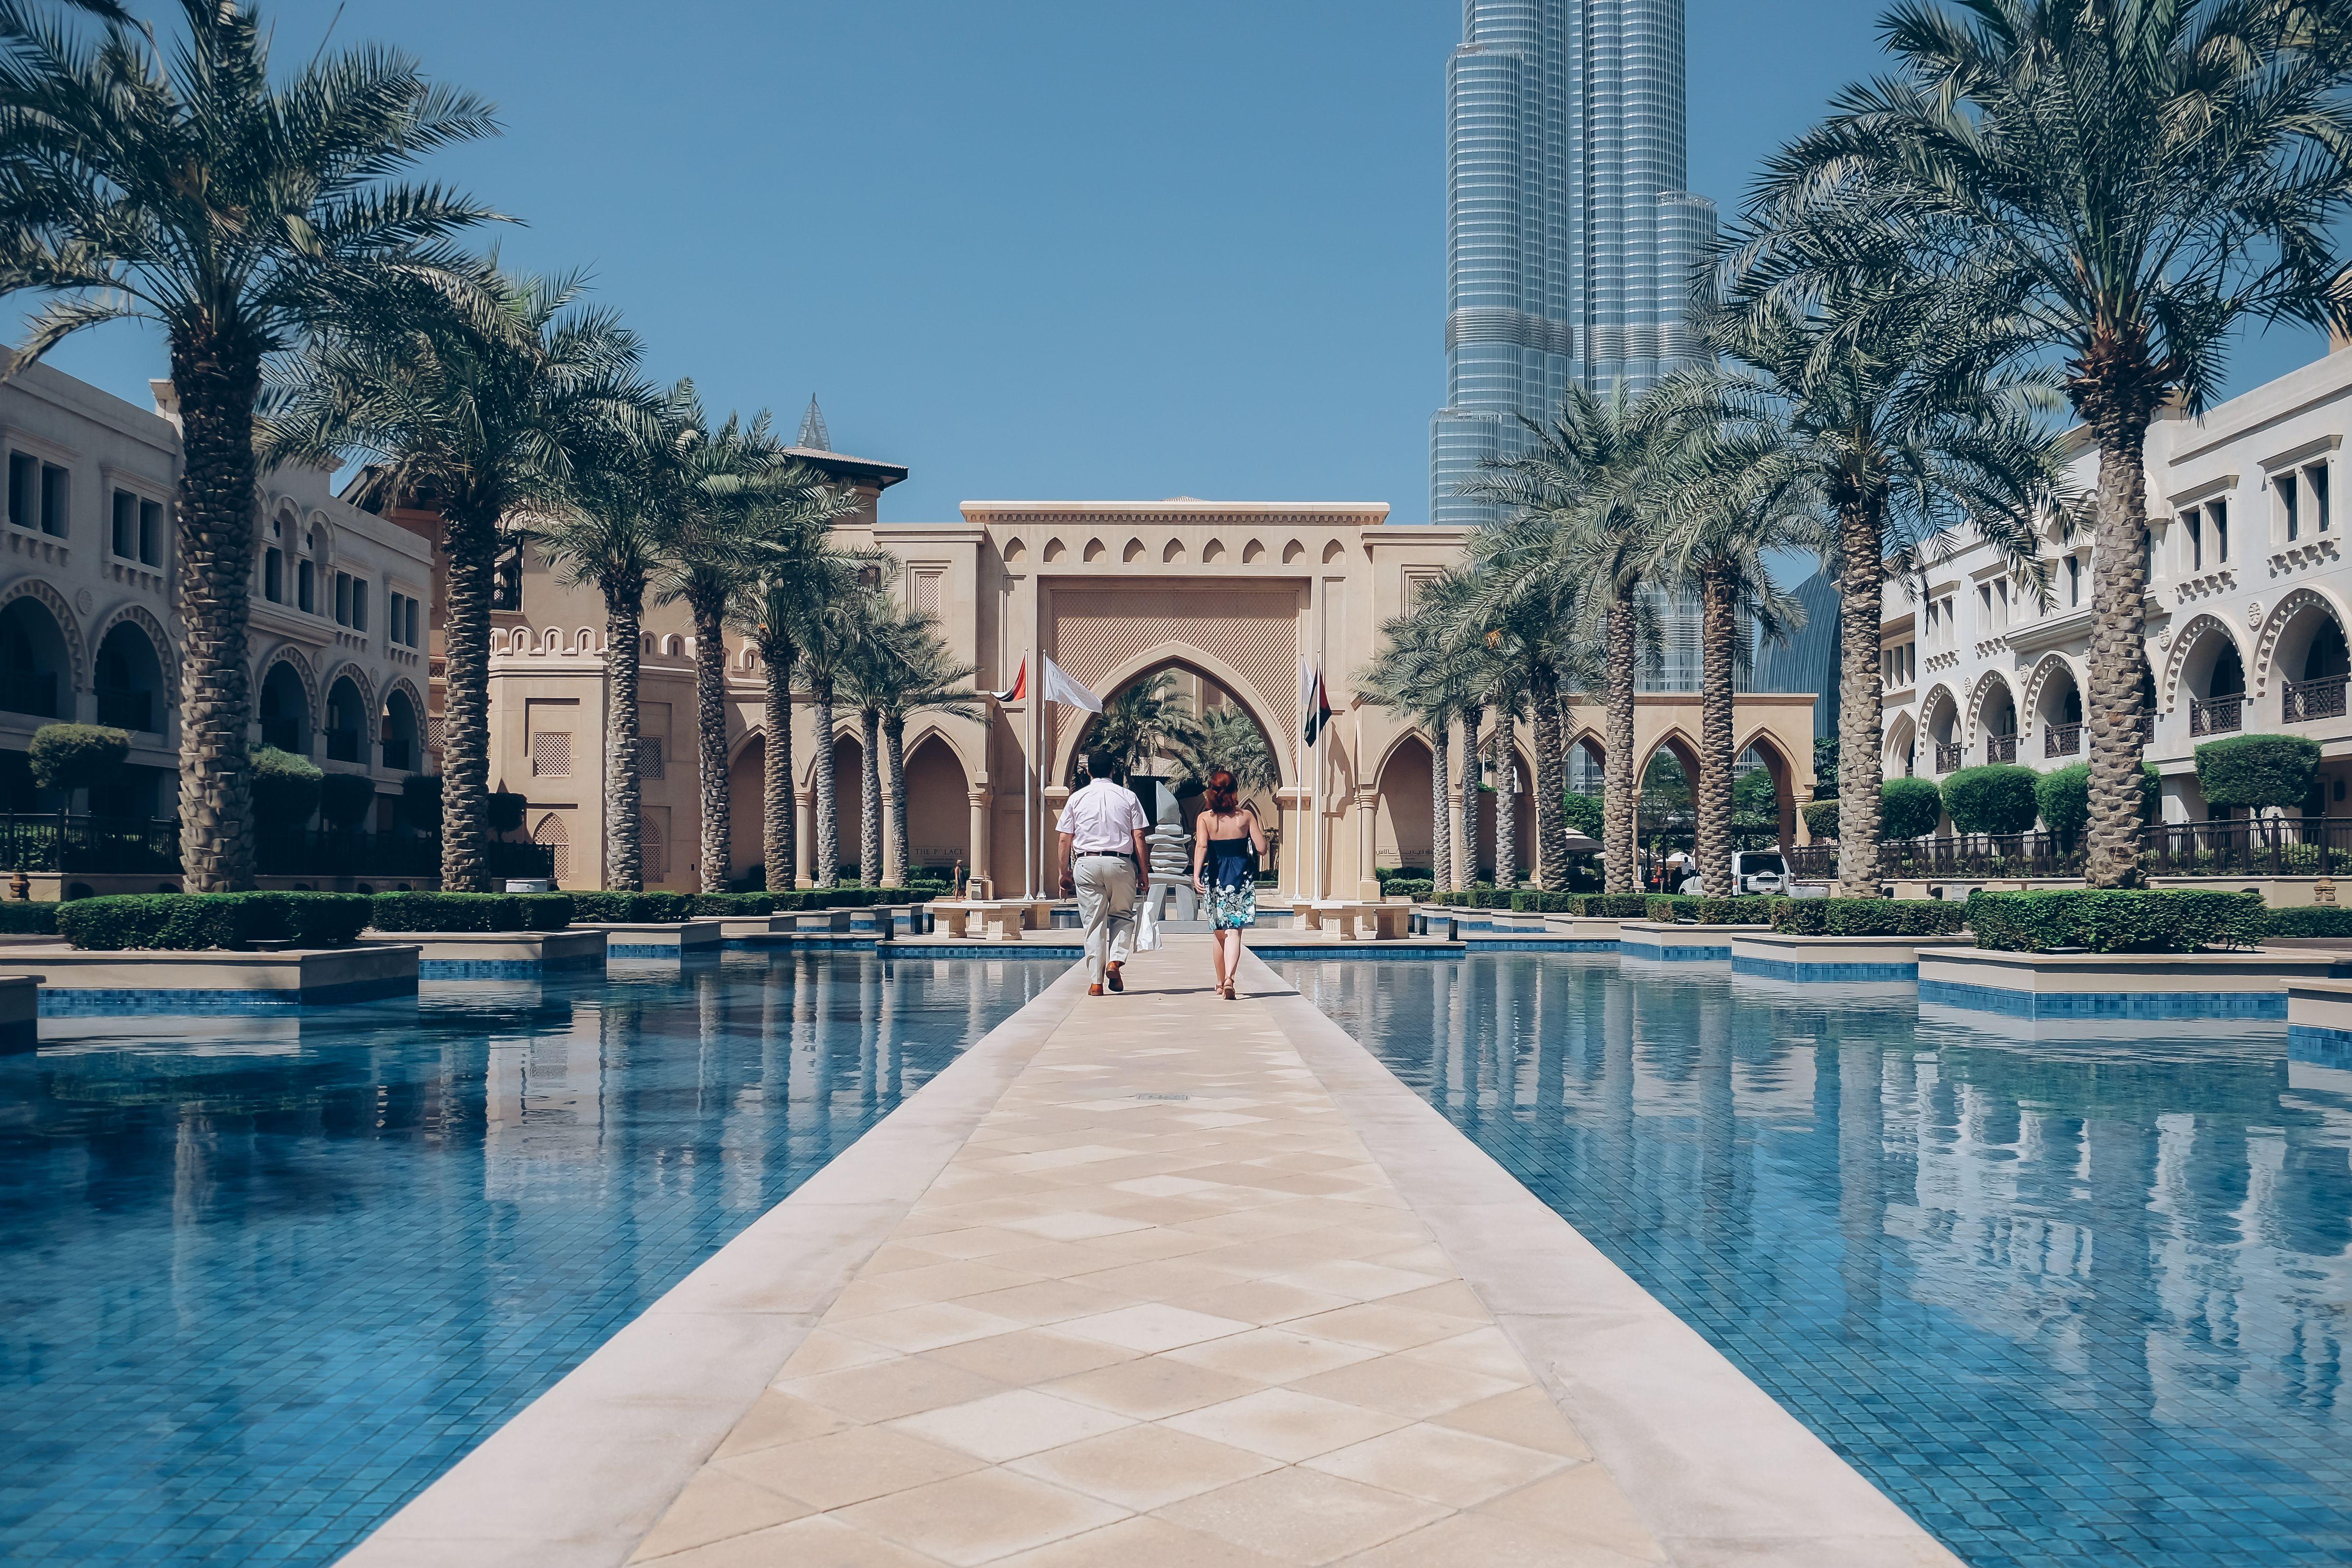 Palace Downtown Dubai Hotel Honeymoon In Dubai Dubai Hotel Dubai Vacation